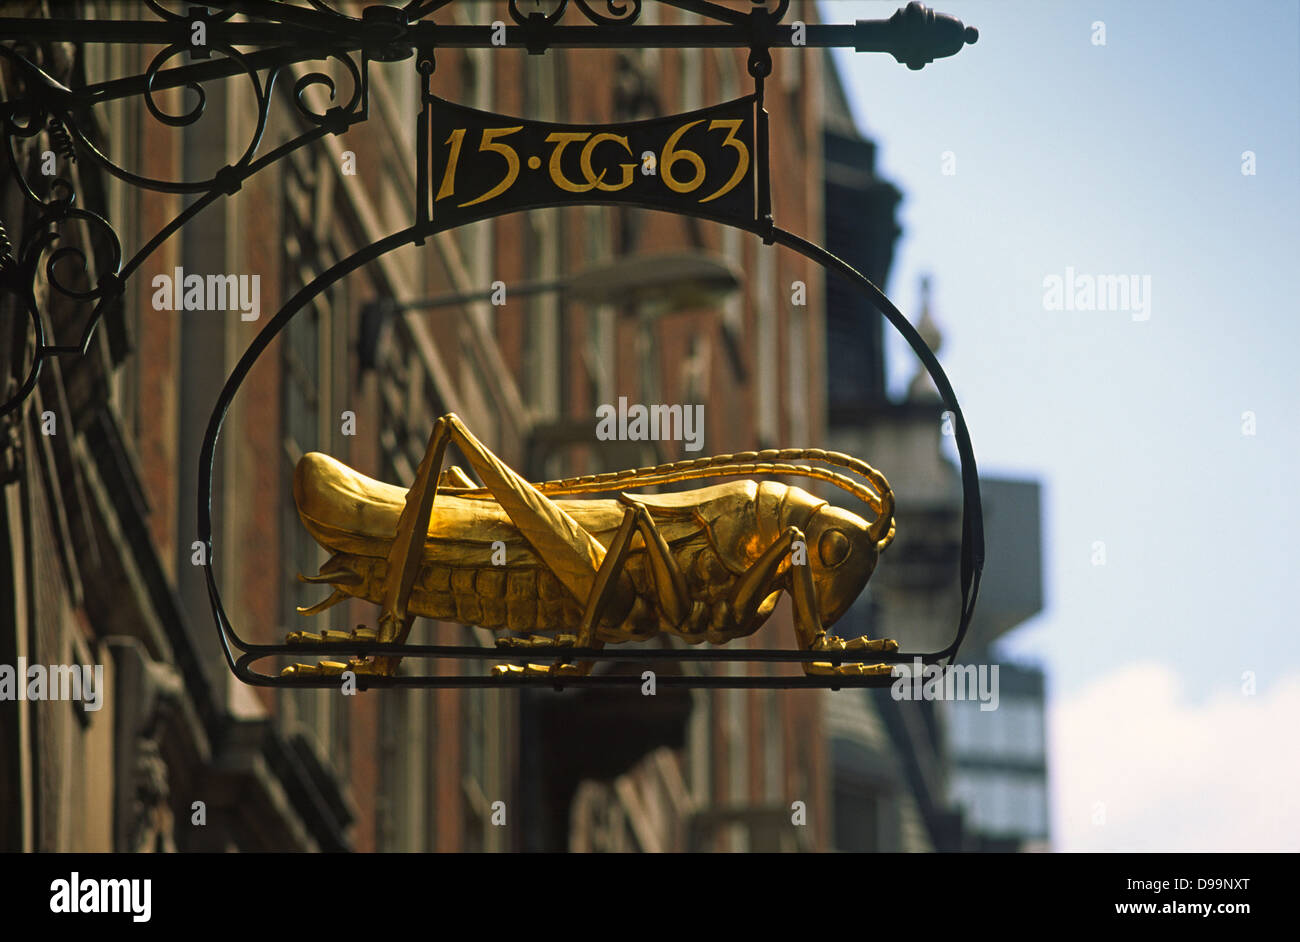 Sir Thomas Gresham's grasshopper motif in Lombard Street in the city of London - Stock Image